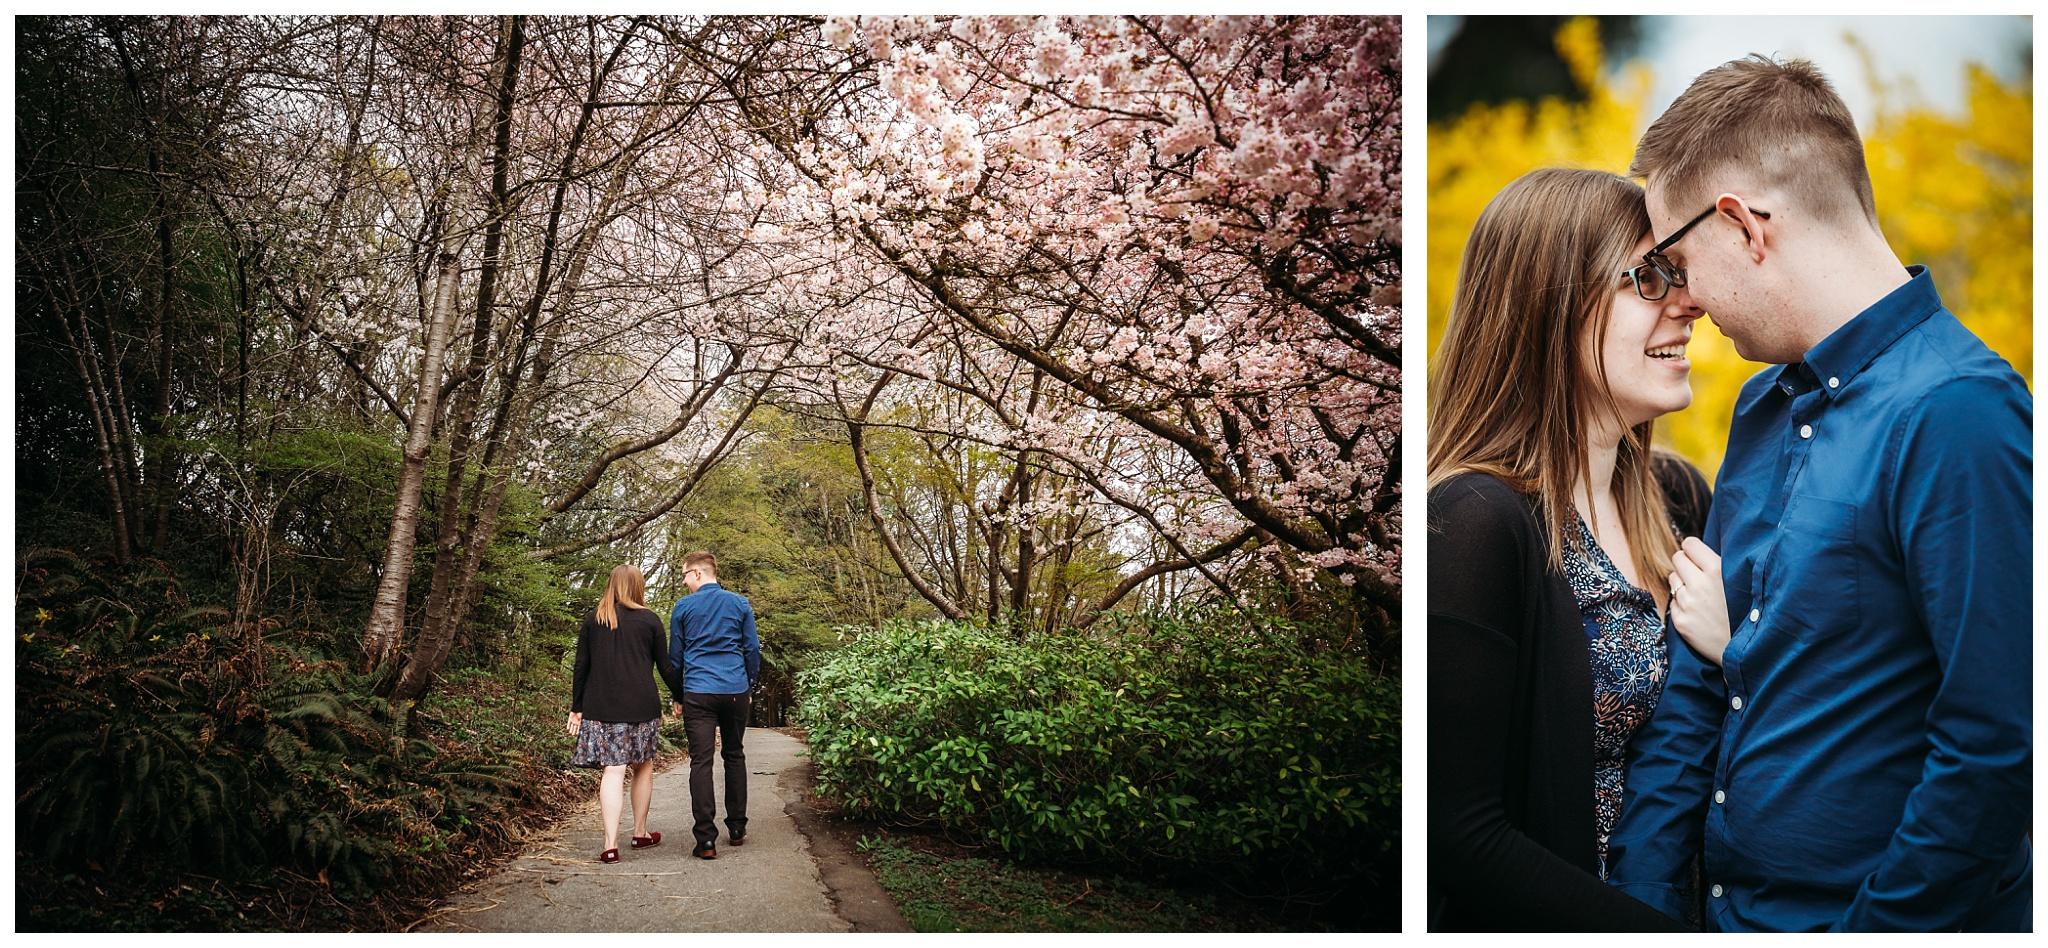 Queen Elizabeth Park Spring Engagement Photography Cherry Blossom Photos Couple Romantic_0016.jpg